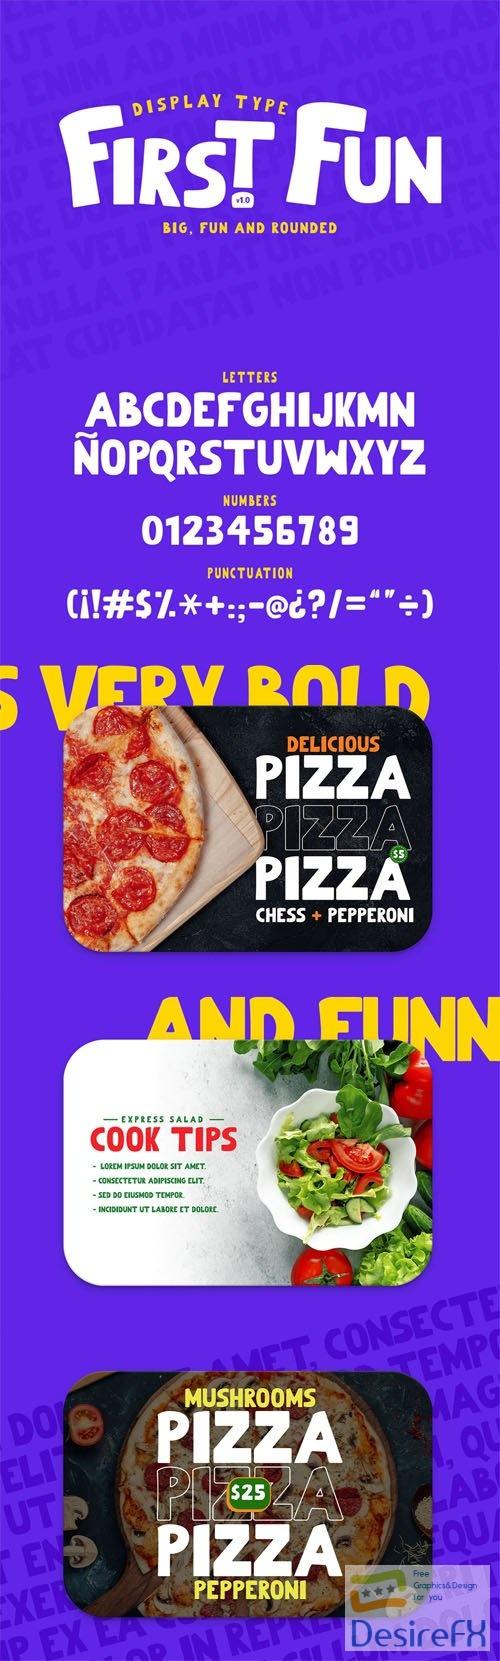 First Fun - Thick Playful Font